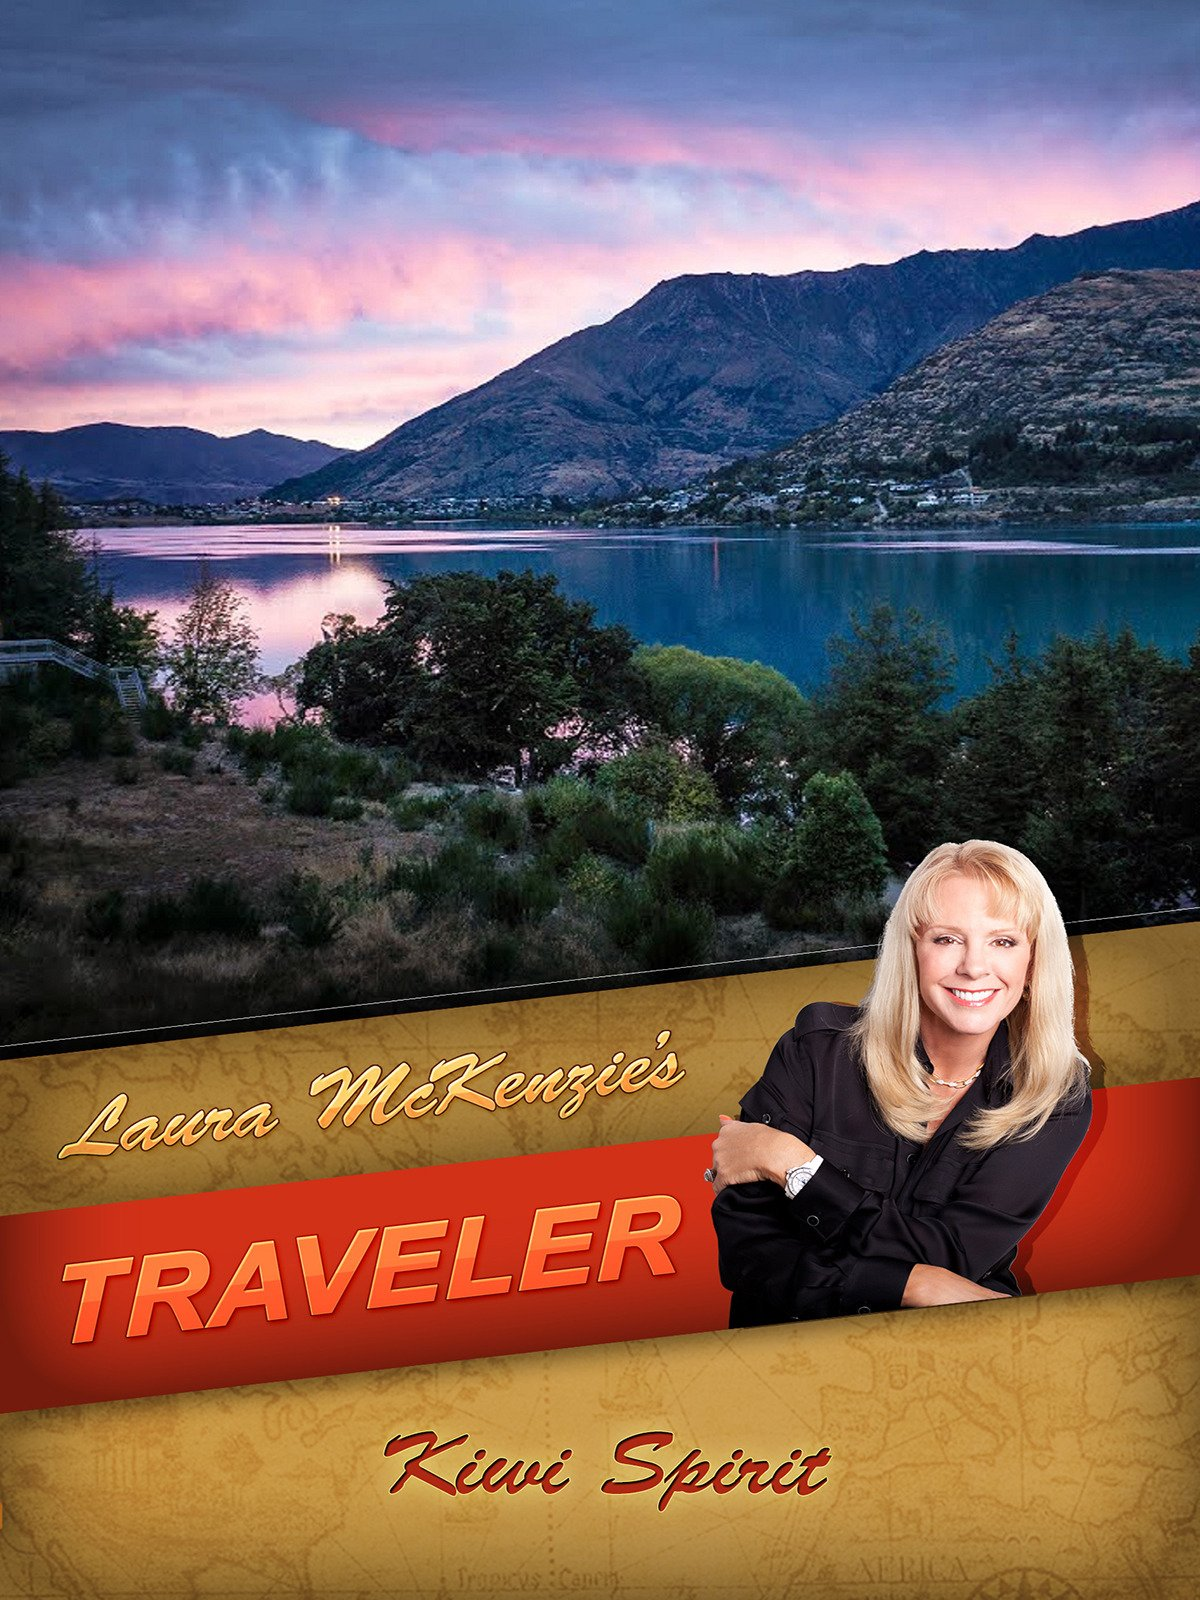 Laura McKenzie's Traveler - Kiwi Spirit